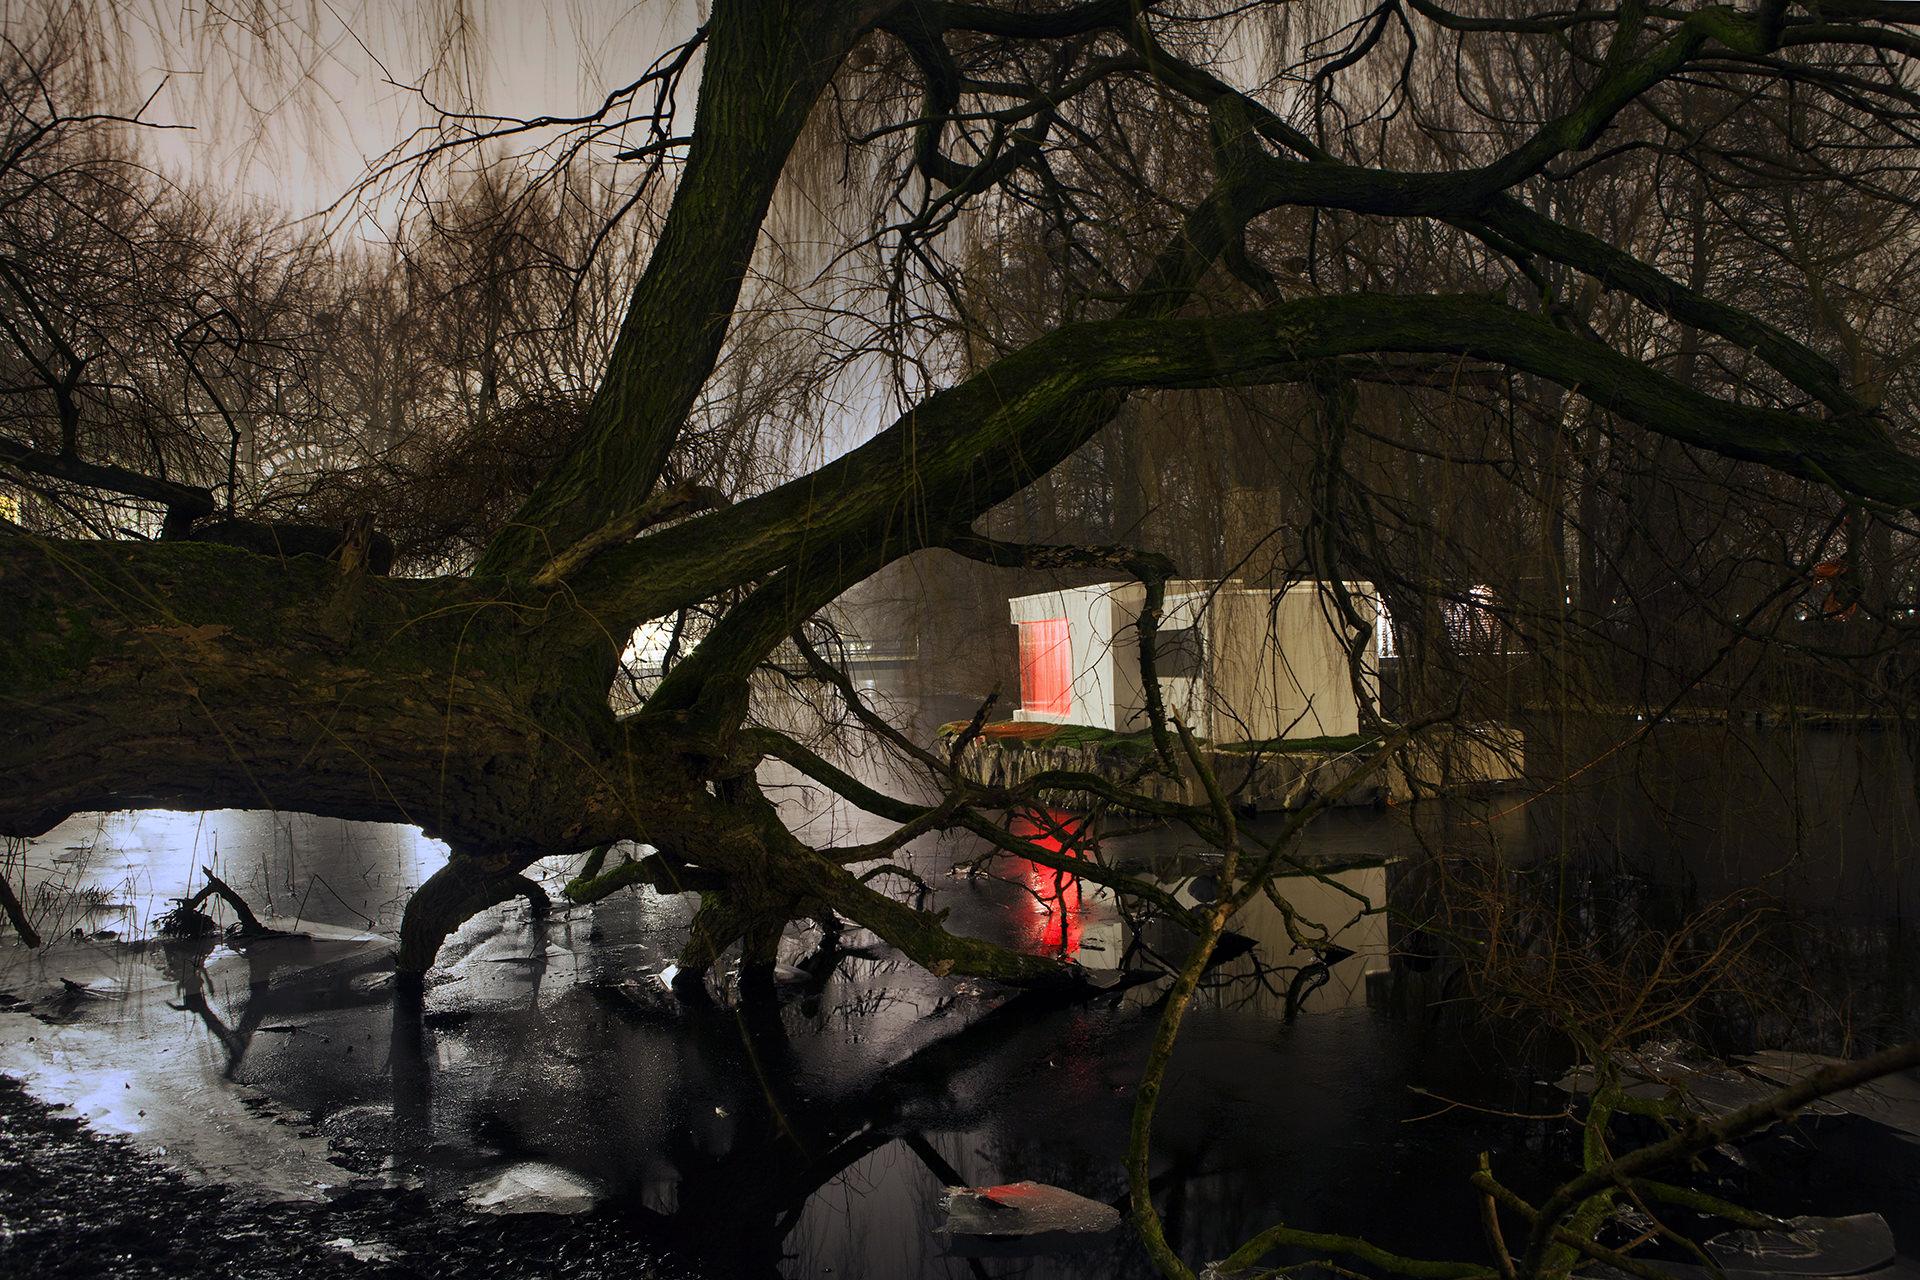 Nacht-Amsterdam-erasmuspark-kunsthuisje-Leonard-van-Munster-amsterdam-winter-ijs.jpg